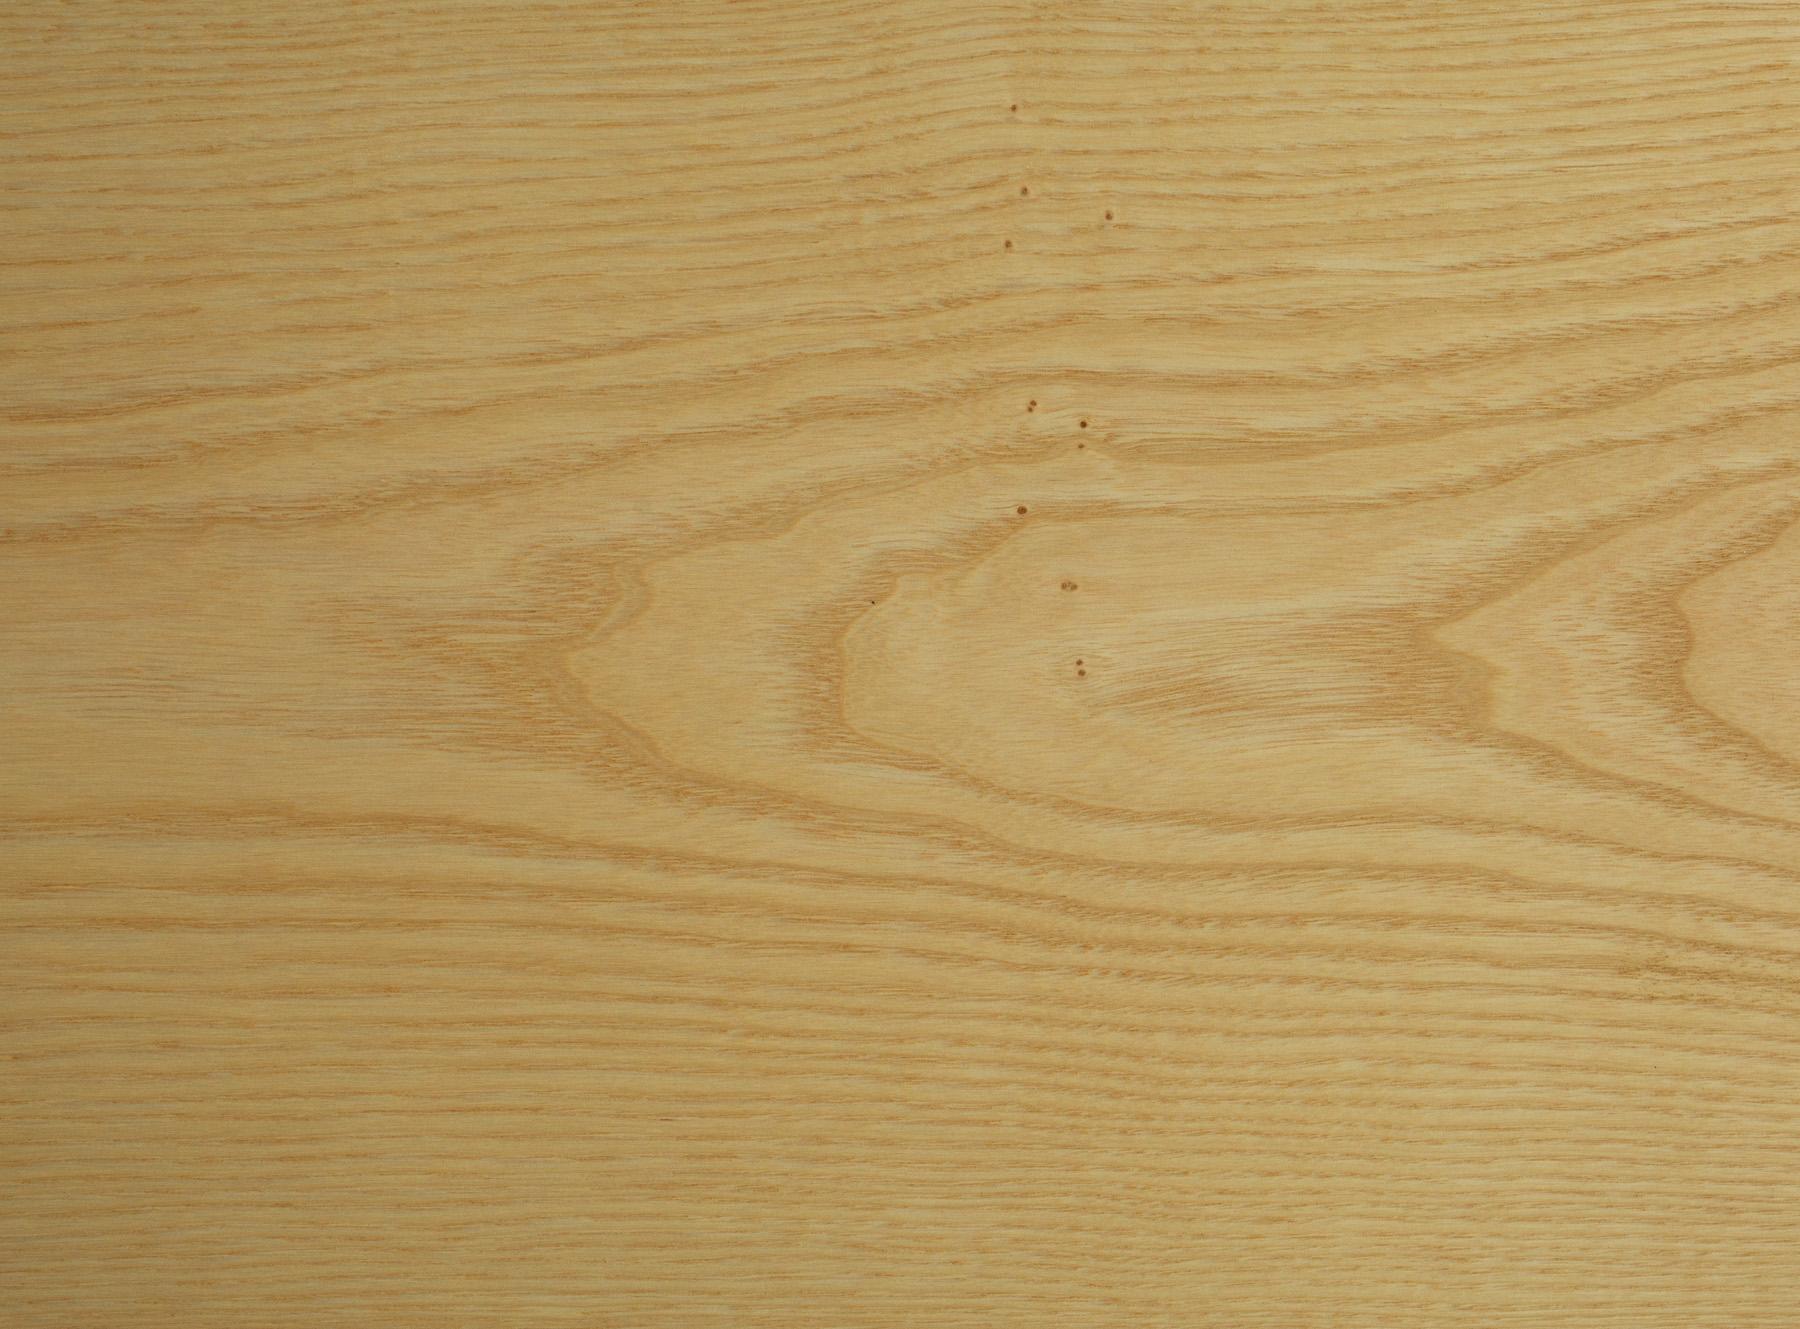 Holz ohne Ast